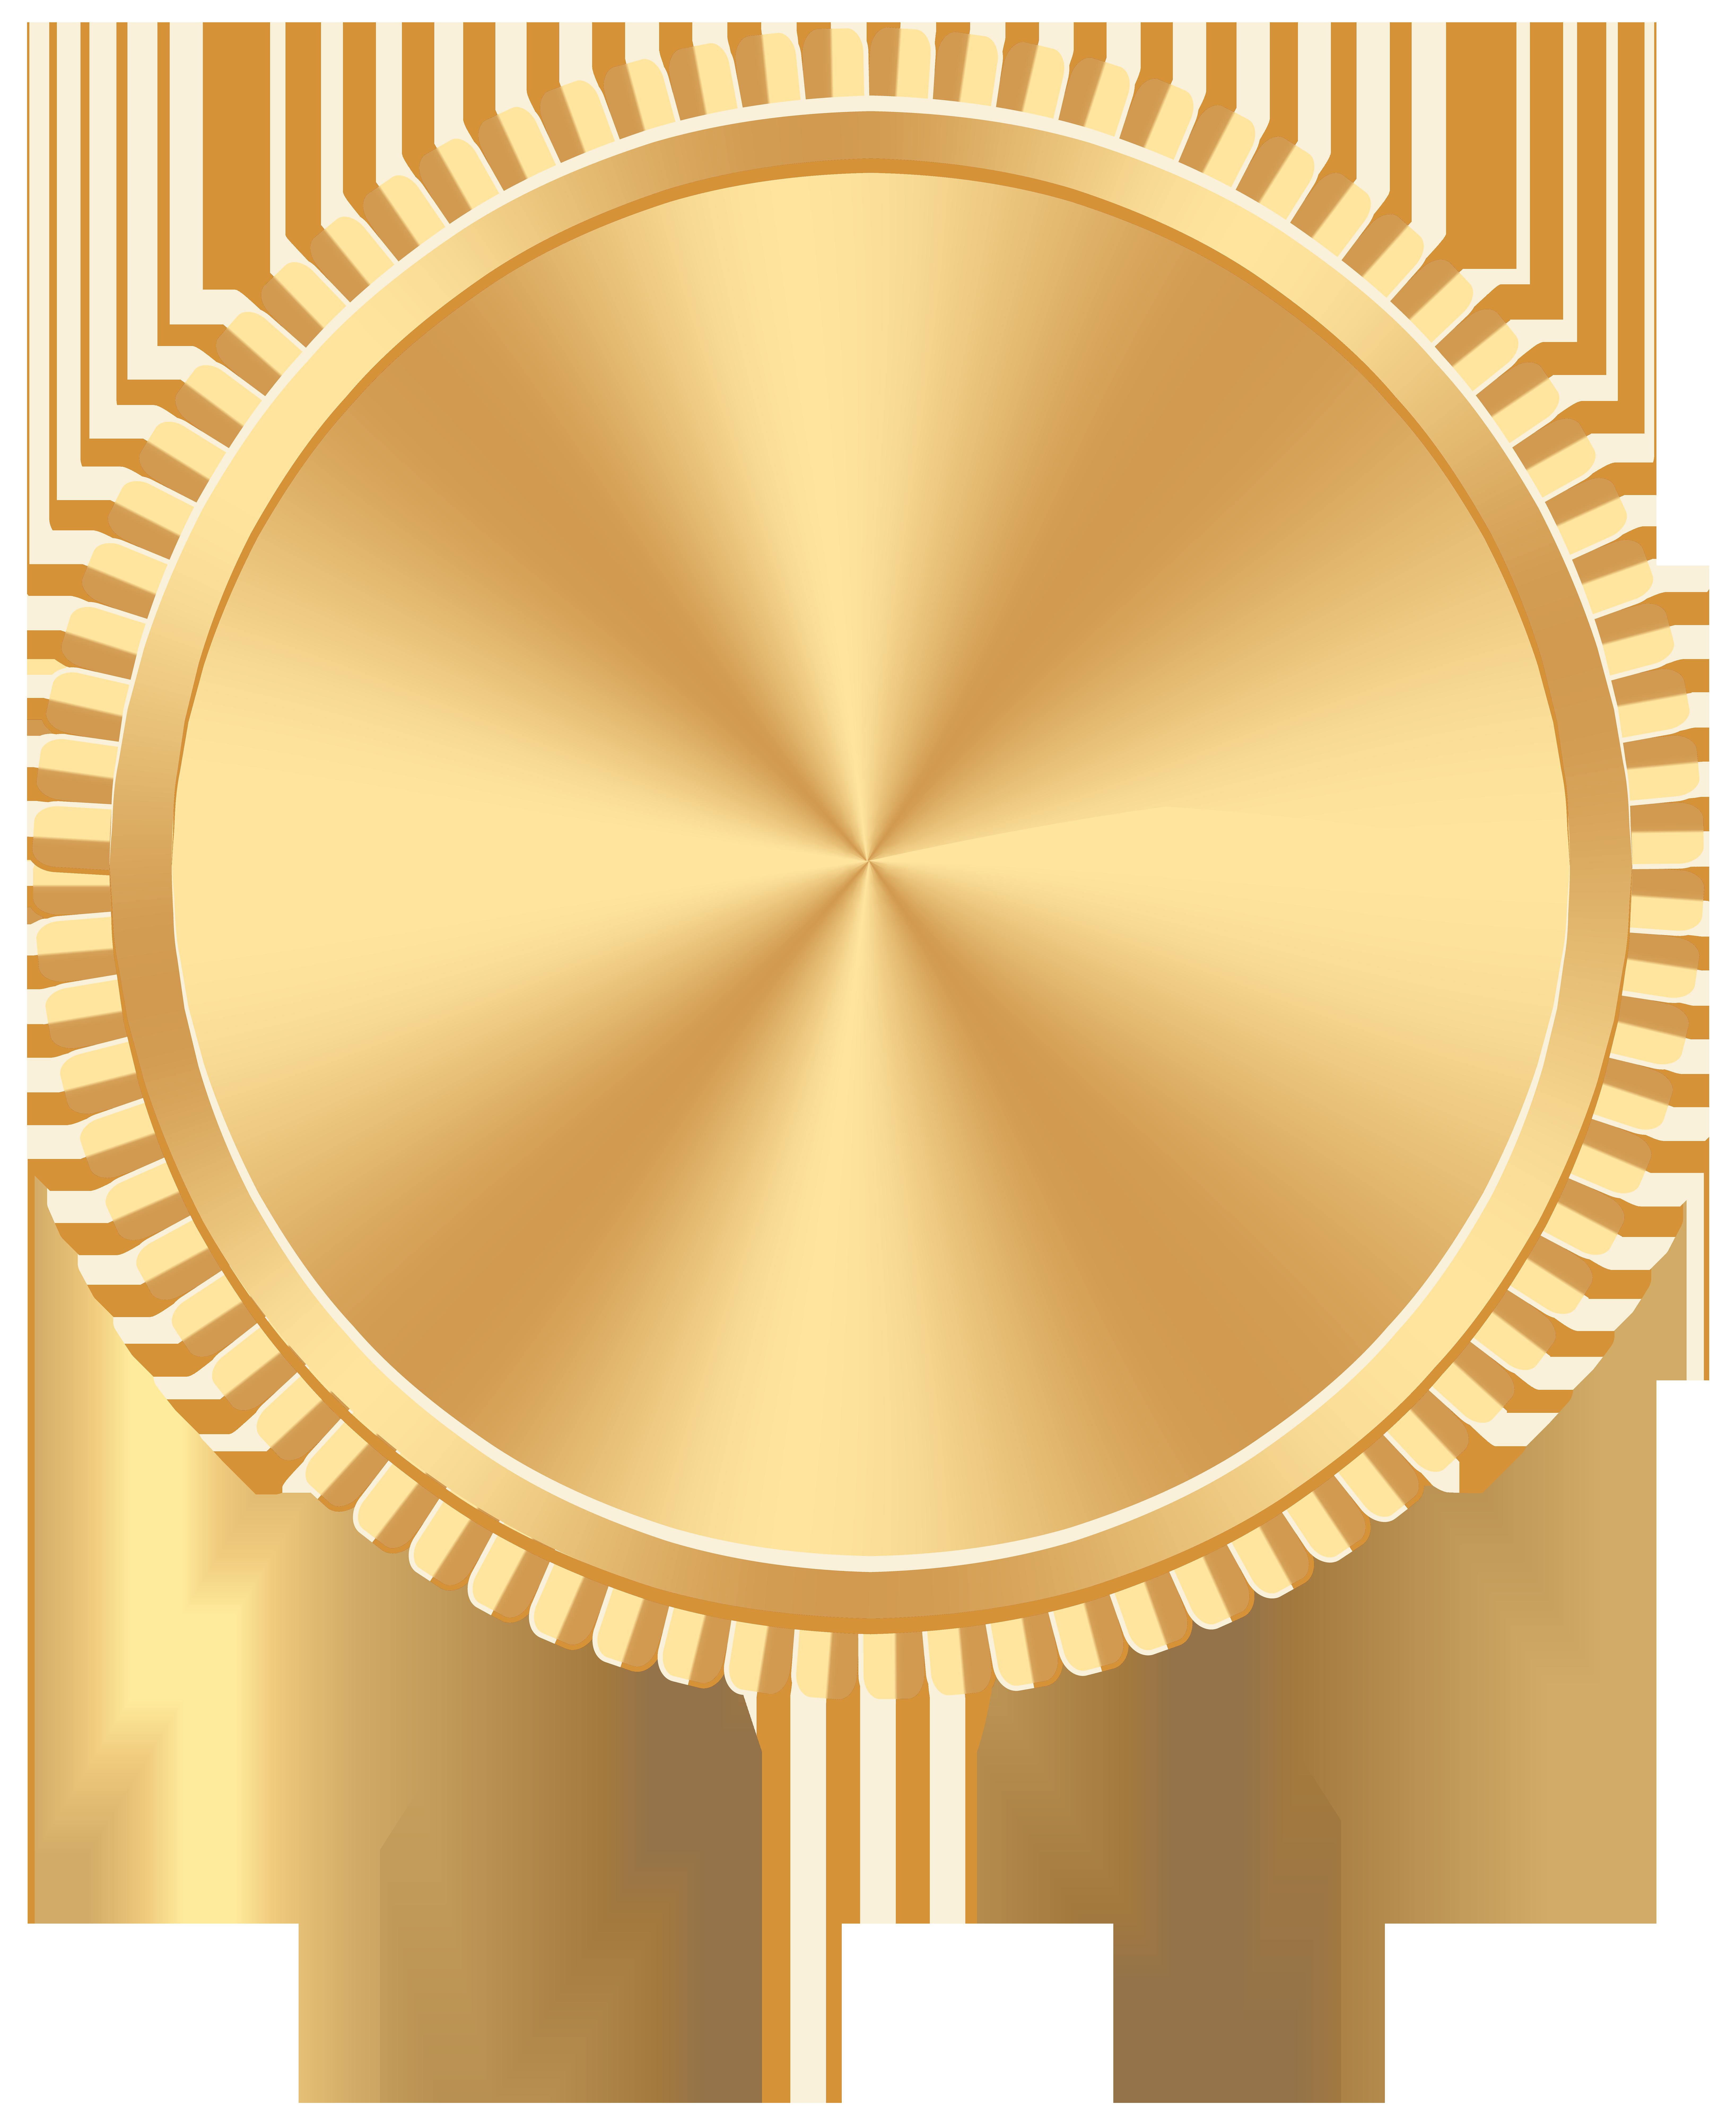 Gold Seal Badge PNG Clip Art Image.